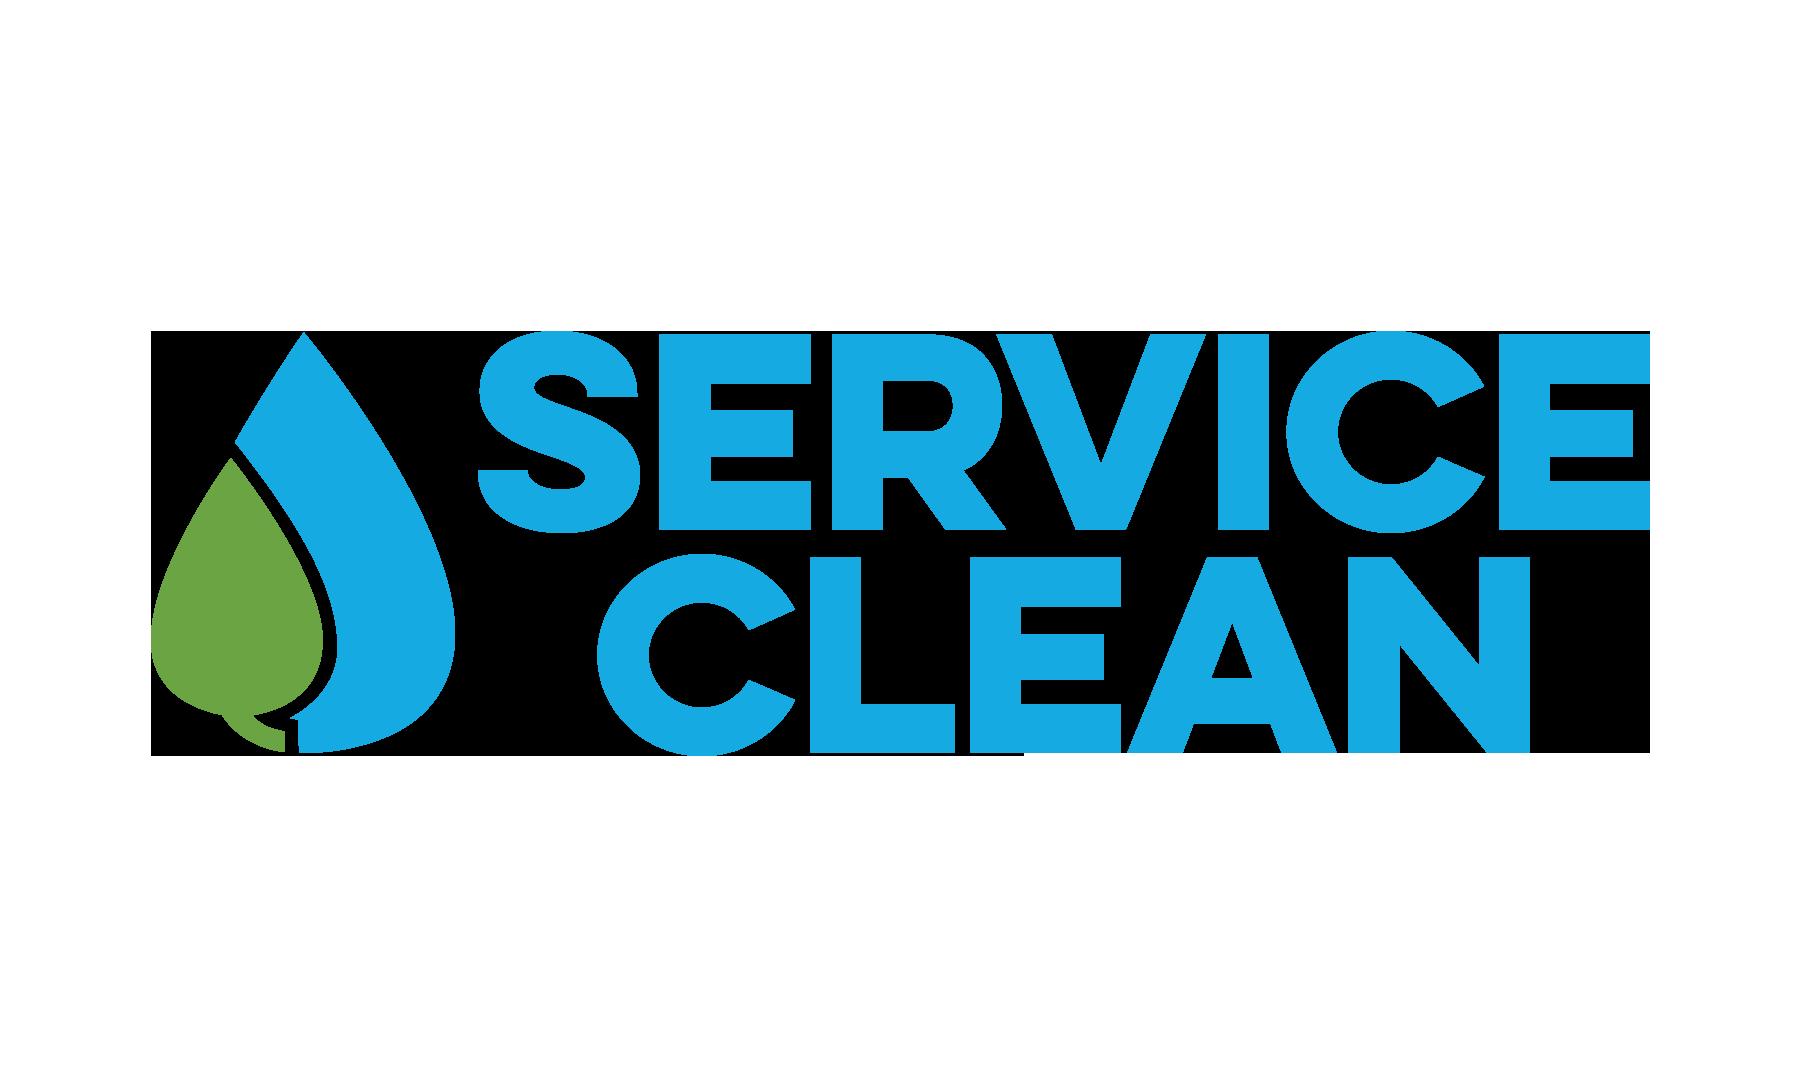 Service Clean